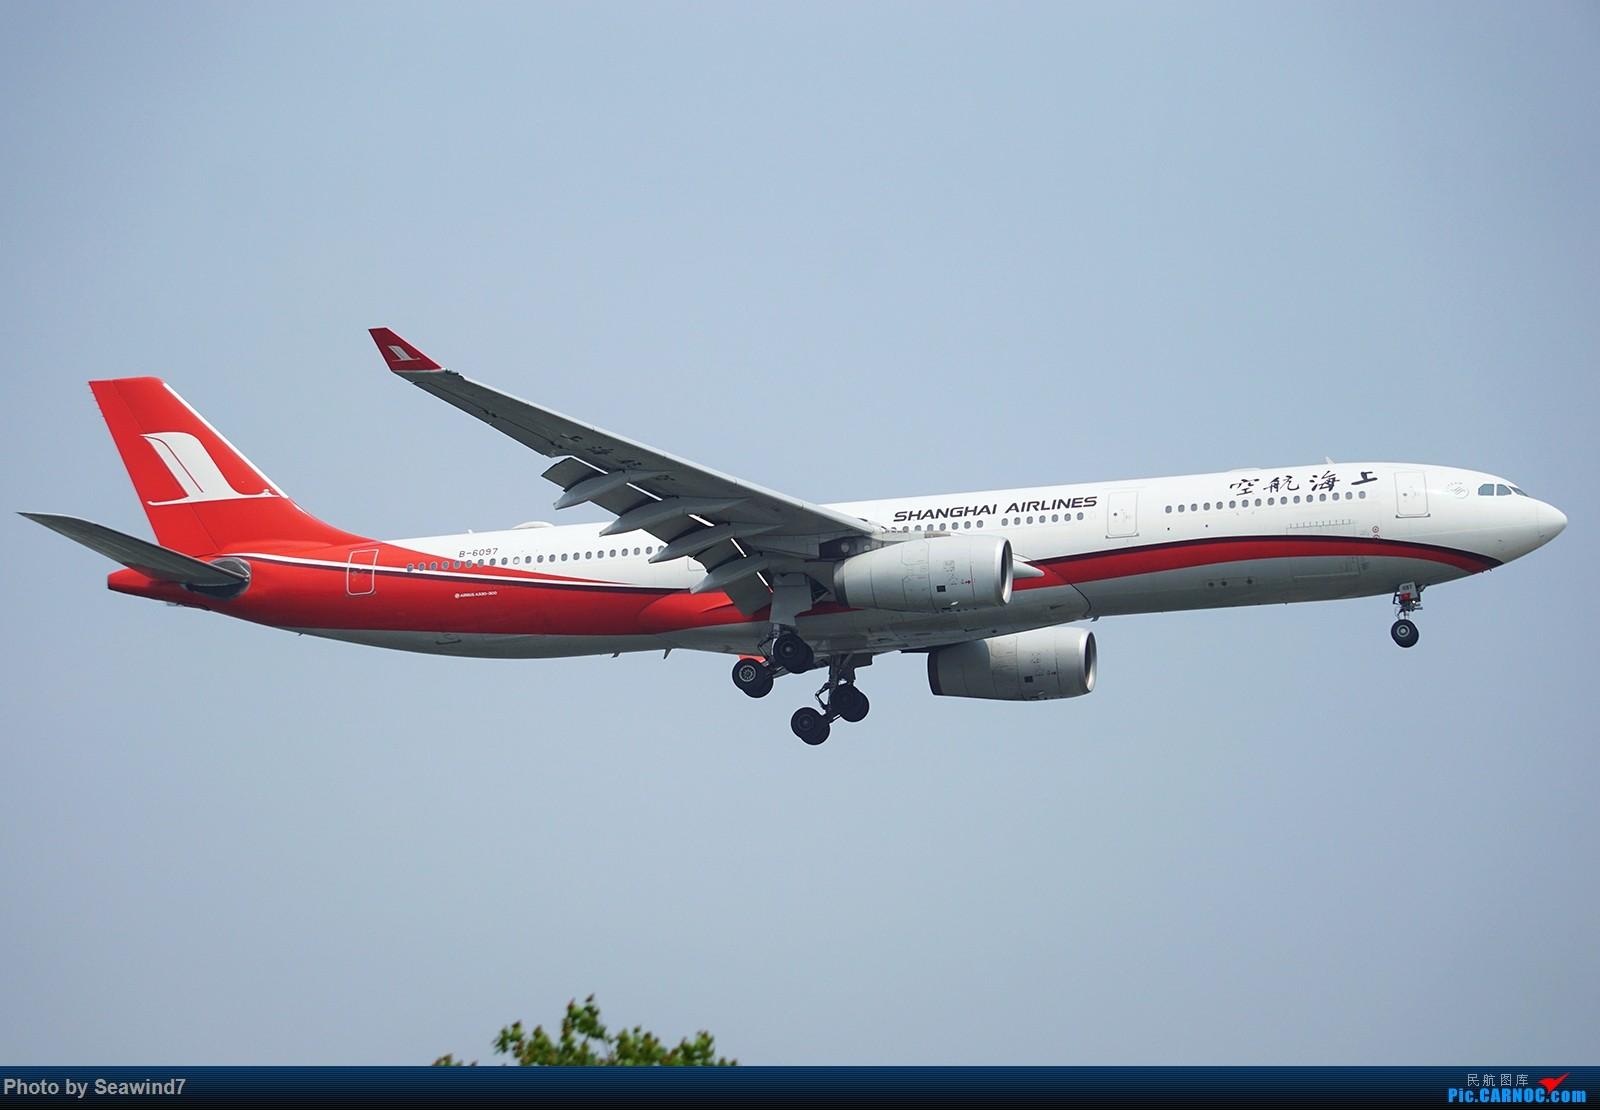 Re:[原创]新手的五一假期(含玩具总动员) AIRBUS A330-300 B-6097 中国上海虹桥国际机场